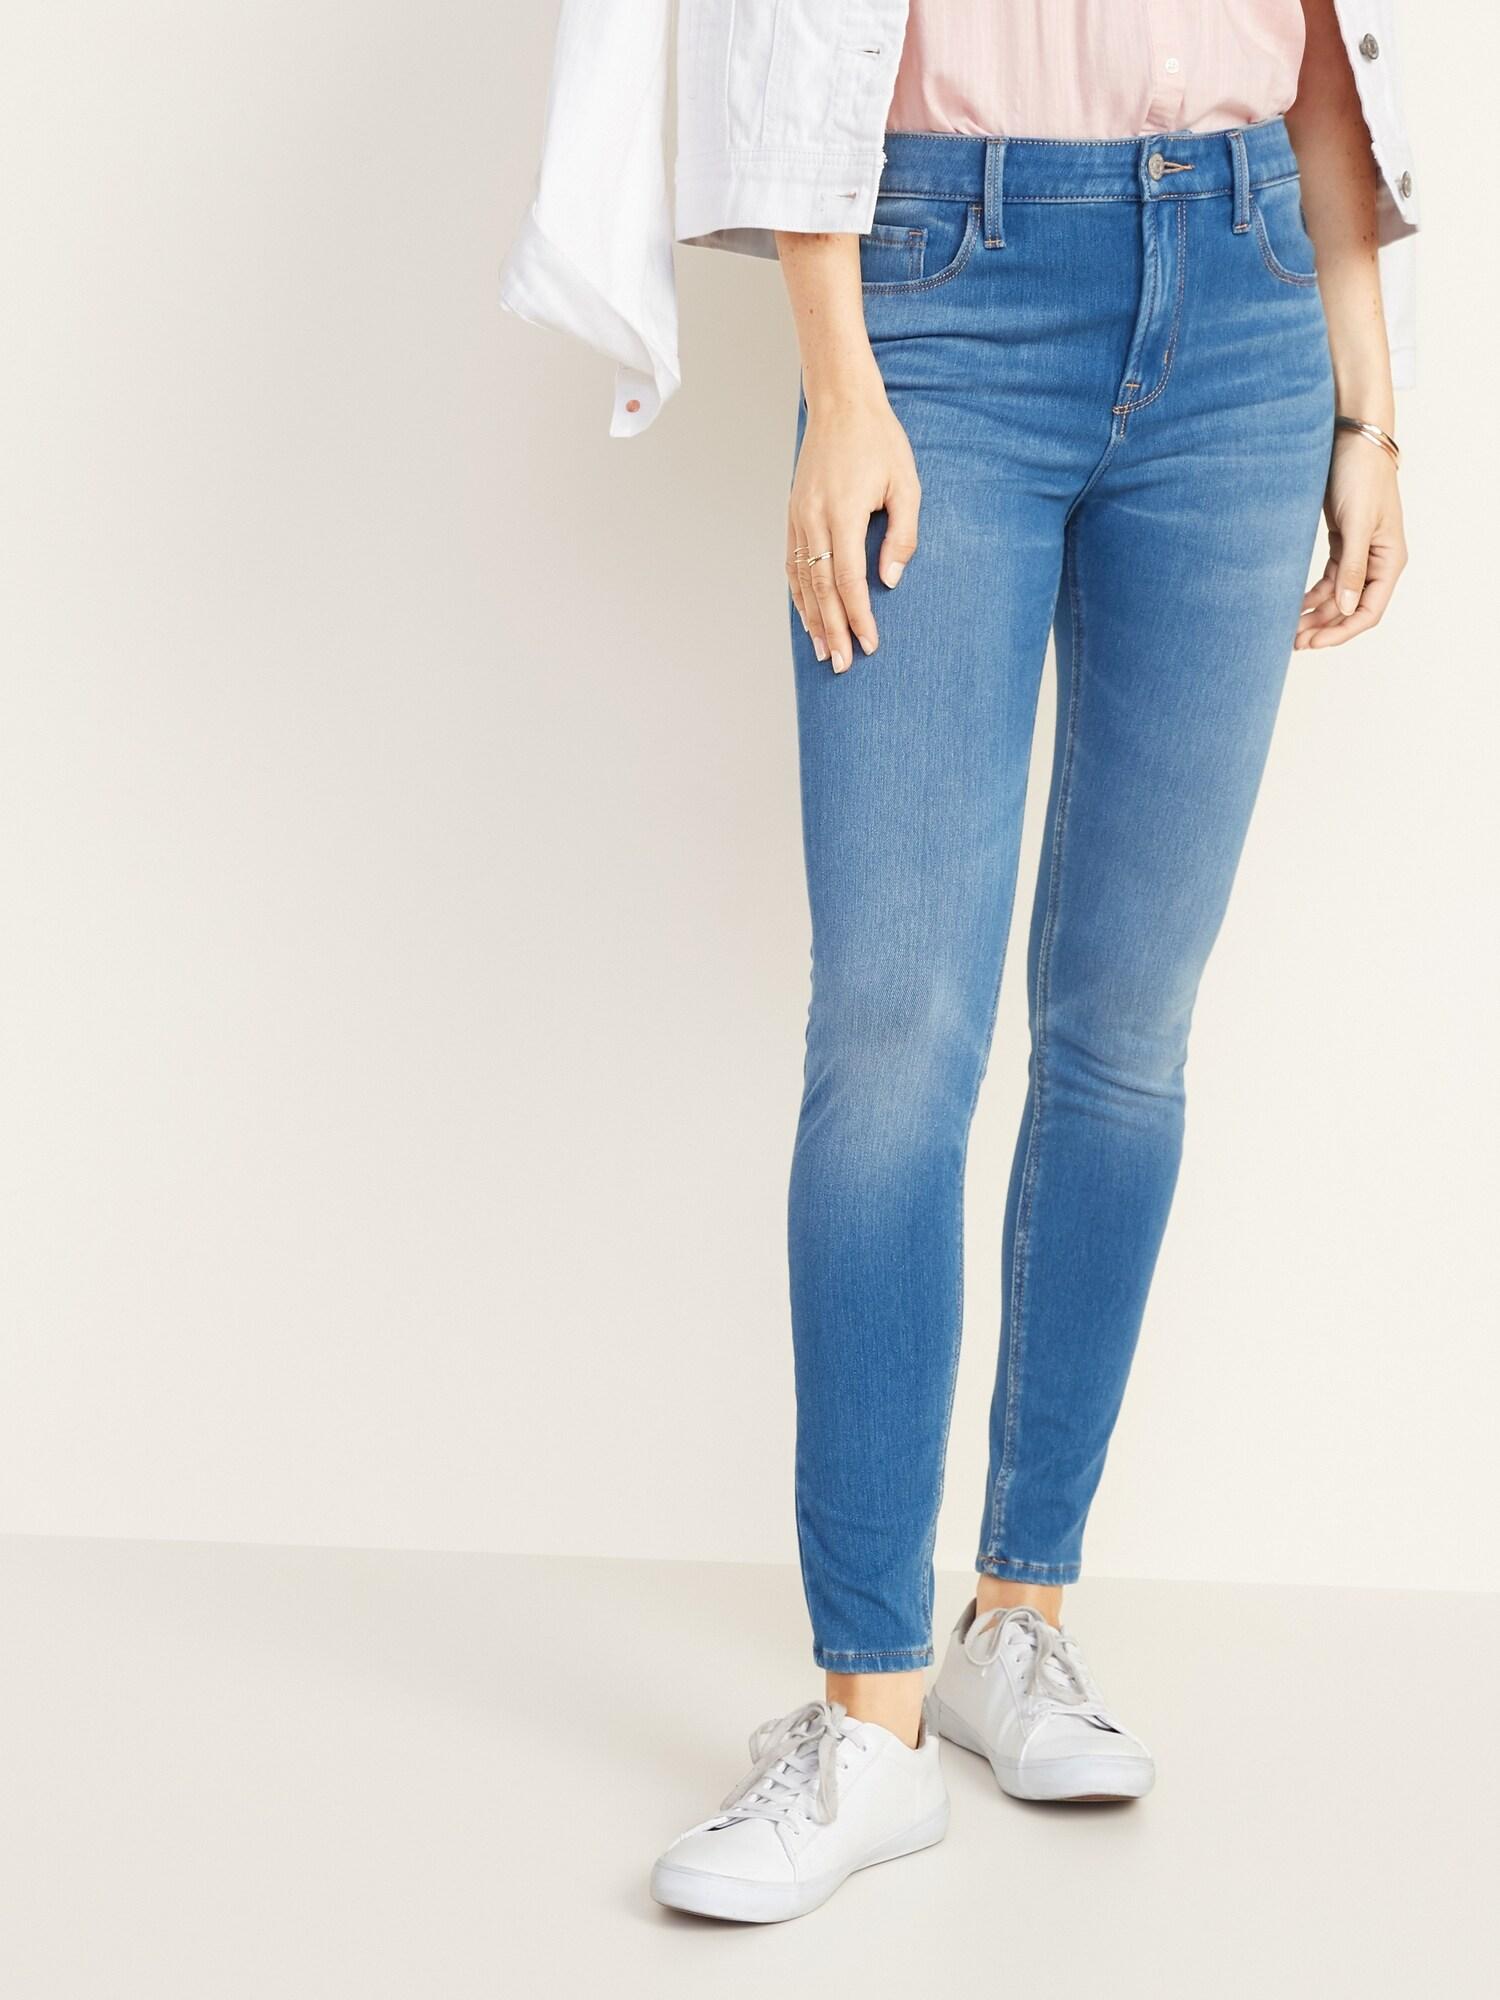 7223dd3107d High-Rise Rockstar 24/7 Sculpt Super Skinny Jeans for Women | Old Navy